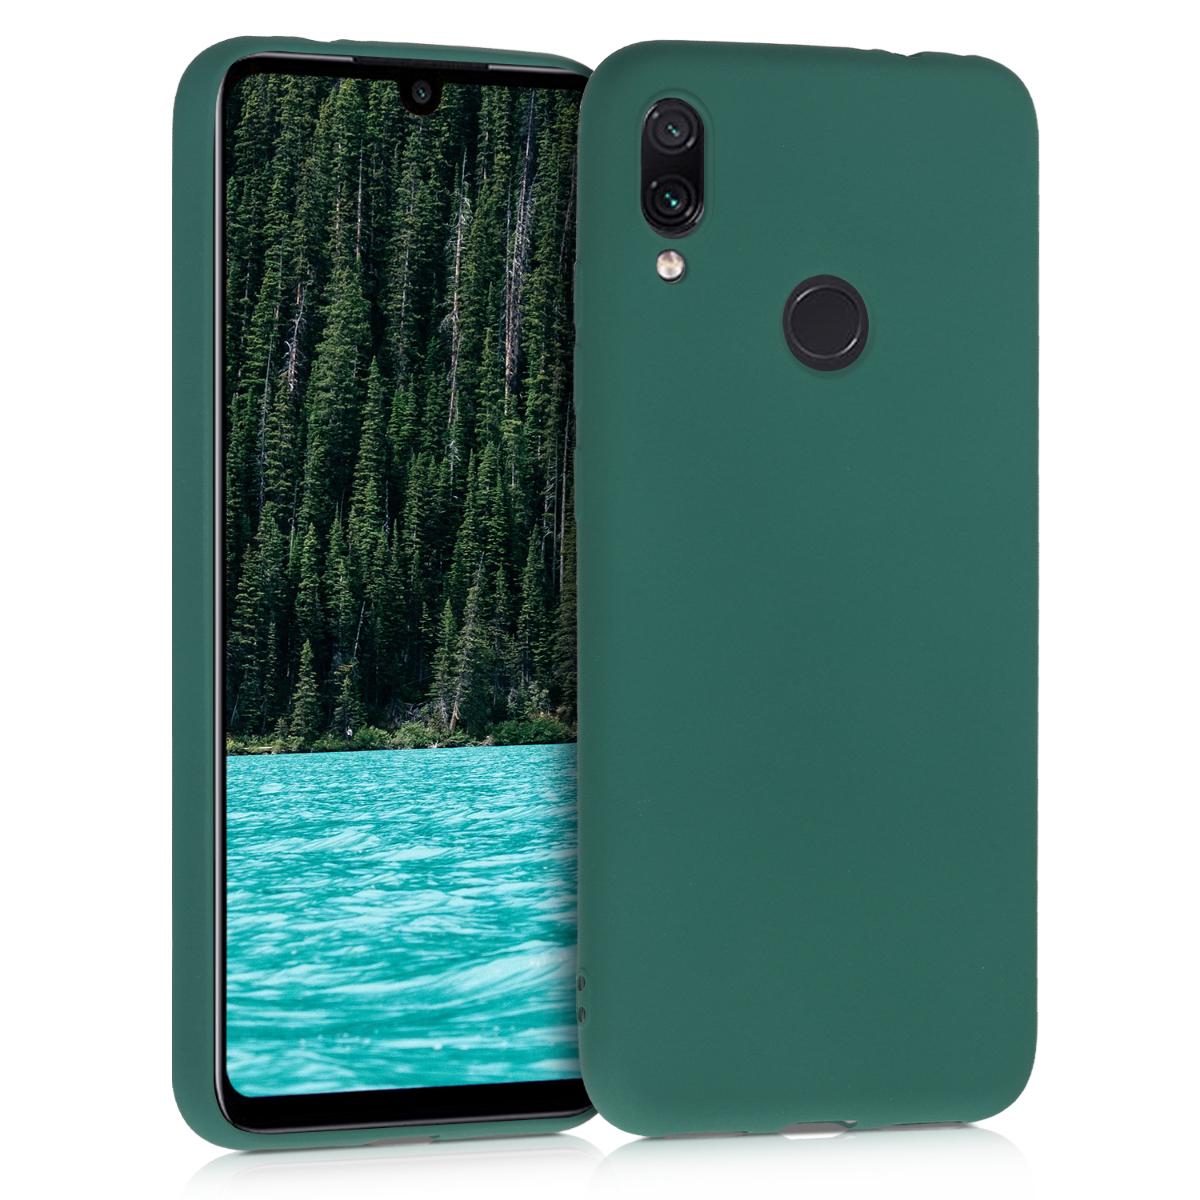 KW Θήκη Σιλικόνης Xiaomi Redmi Note 7 / Note 7 Pro - Dark Green (47570.170)